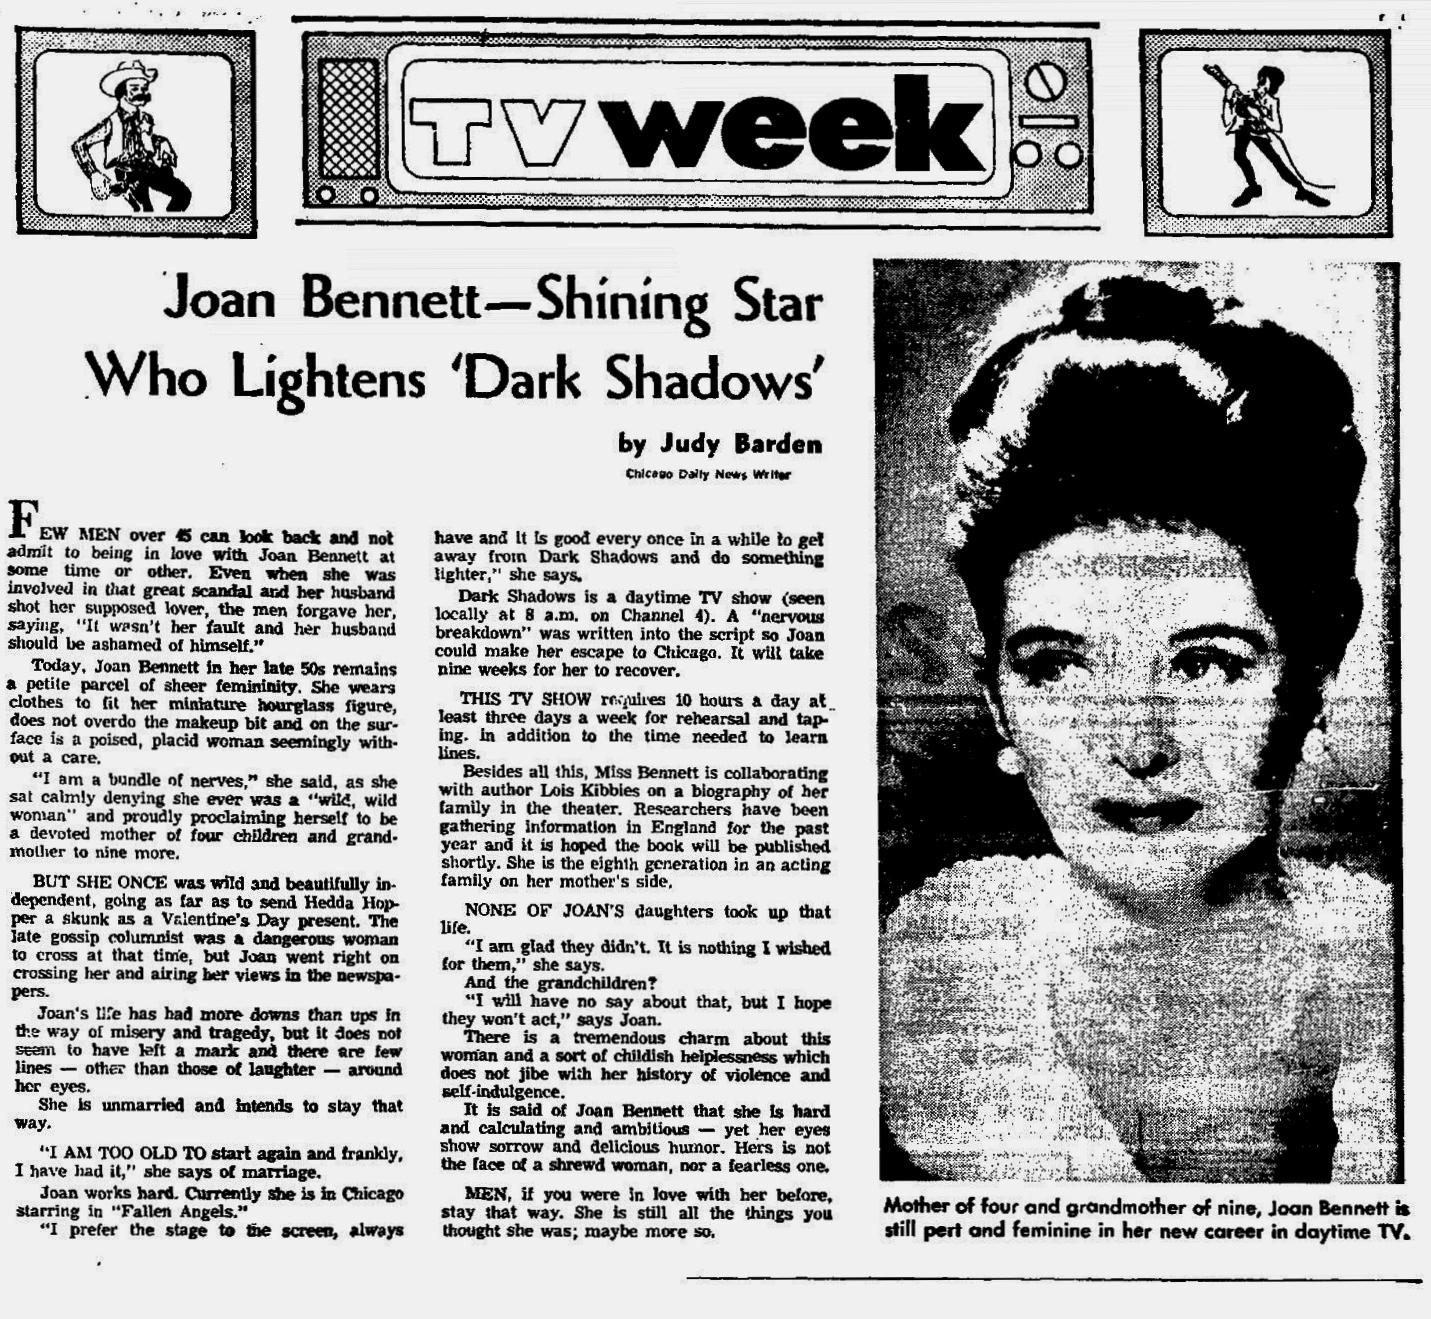 http://4.bp.blogspot.com/-w2FIiEPy-uU/TyGk6q75WNI/AAAAAAAAADc/_0z9u8amLrI/s1600/Joan+Bennett+--+Shing+Star+Who+Lightens+\'Dark+Shadows\';+The+Salt+Lake+Tribune,+July+28,+1968.jpg